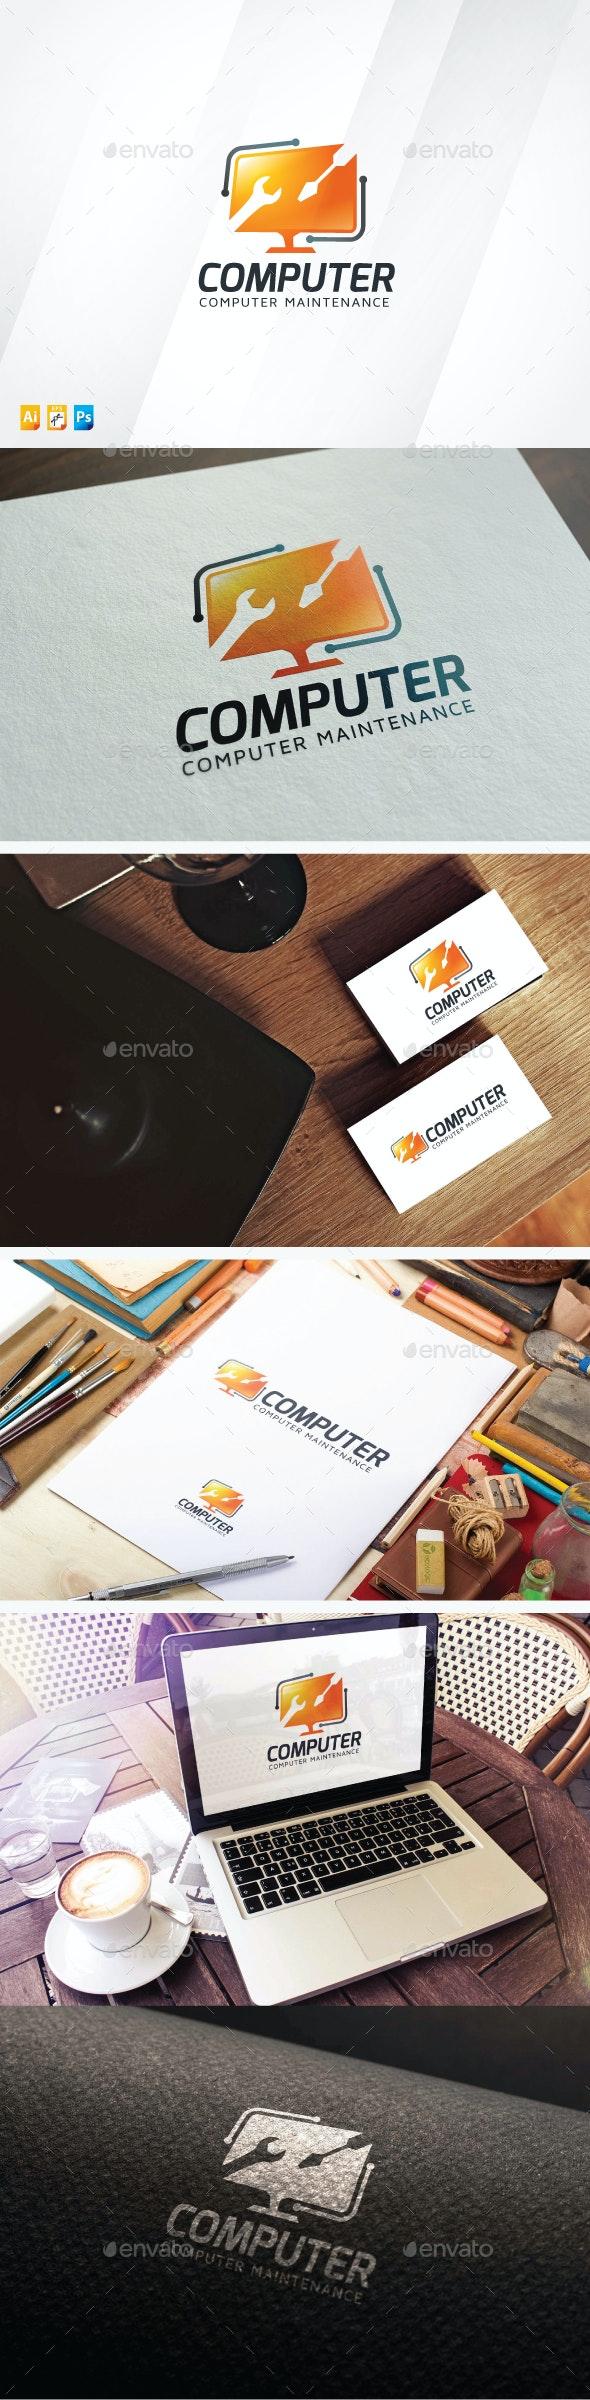 Computer Maintenance Logo - Objects Logo Templates